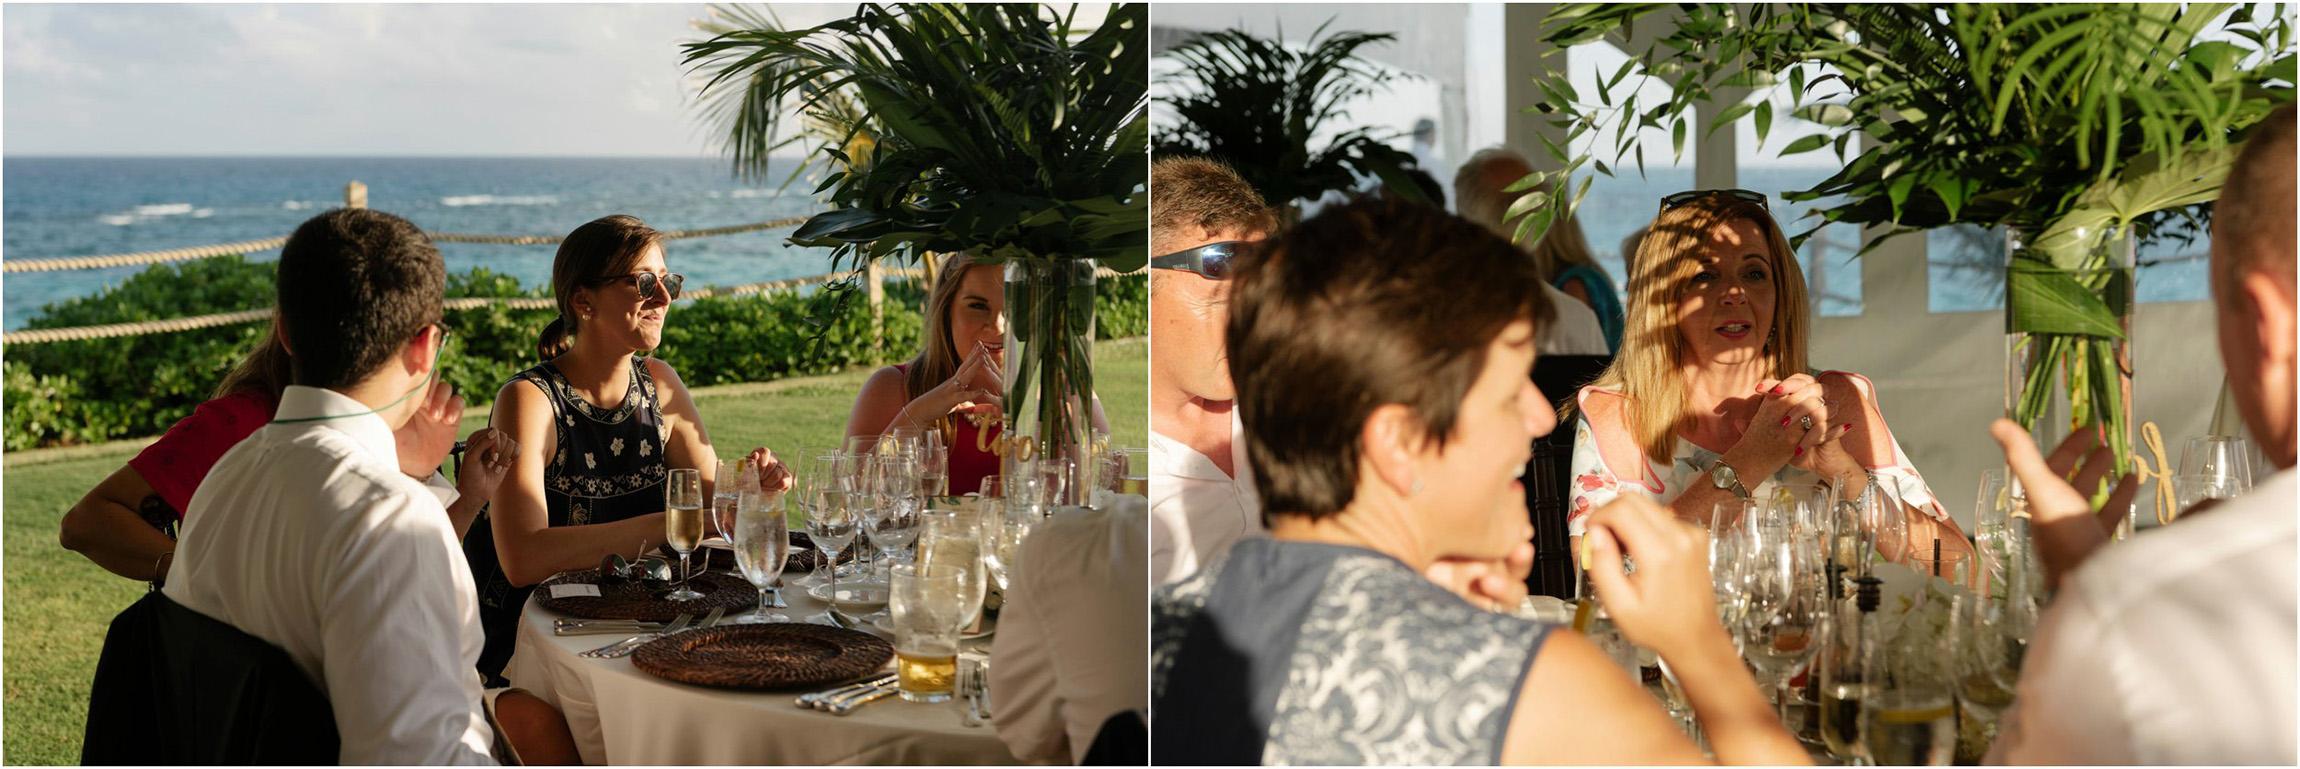 ©FianderFoto_Bermuda Wedding Photographer_Mid Ocean_Rachel_Angus_094.jpg